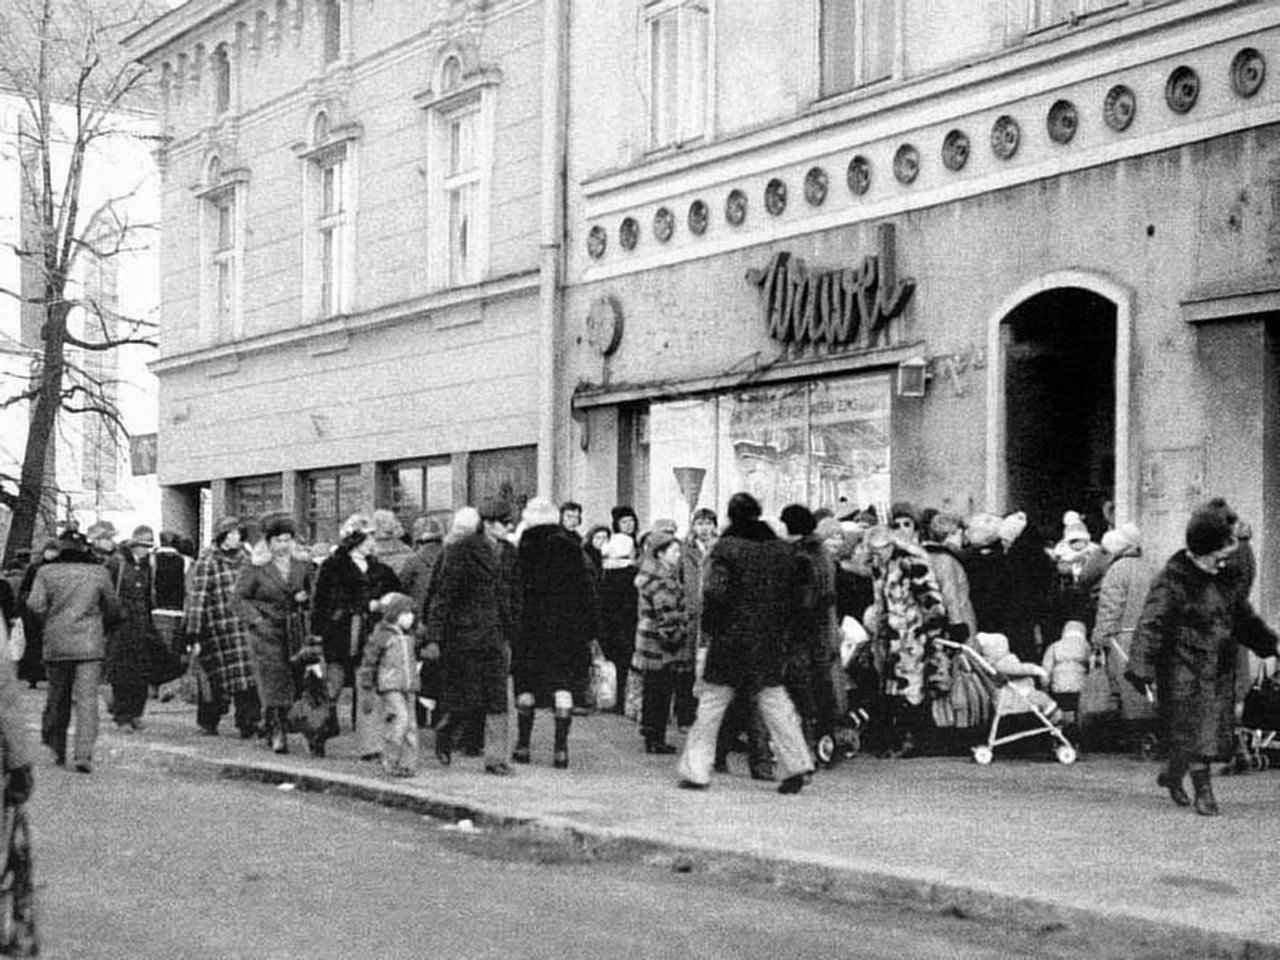 Poloneses fazendo longas filas para obter magros alimentos racionados